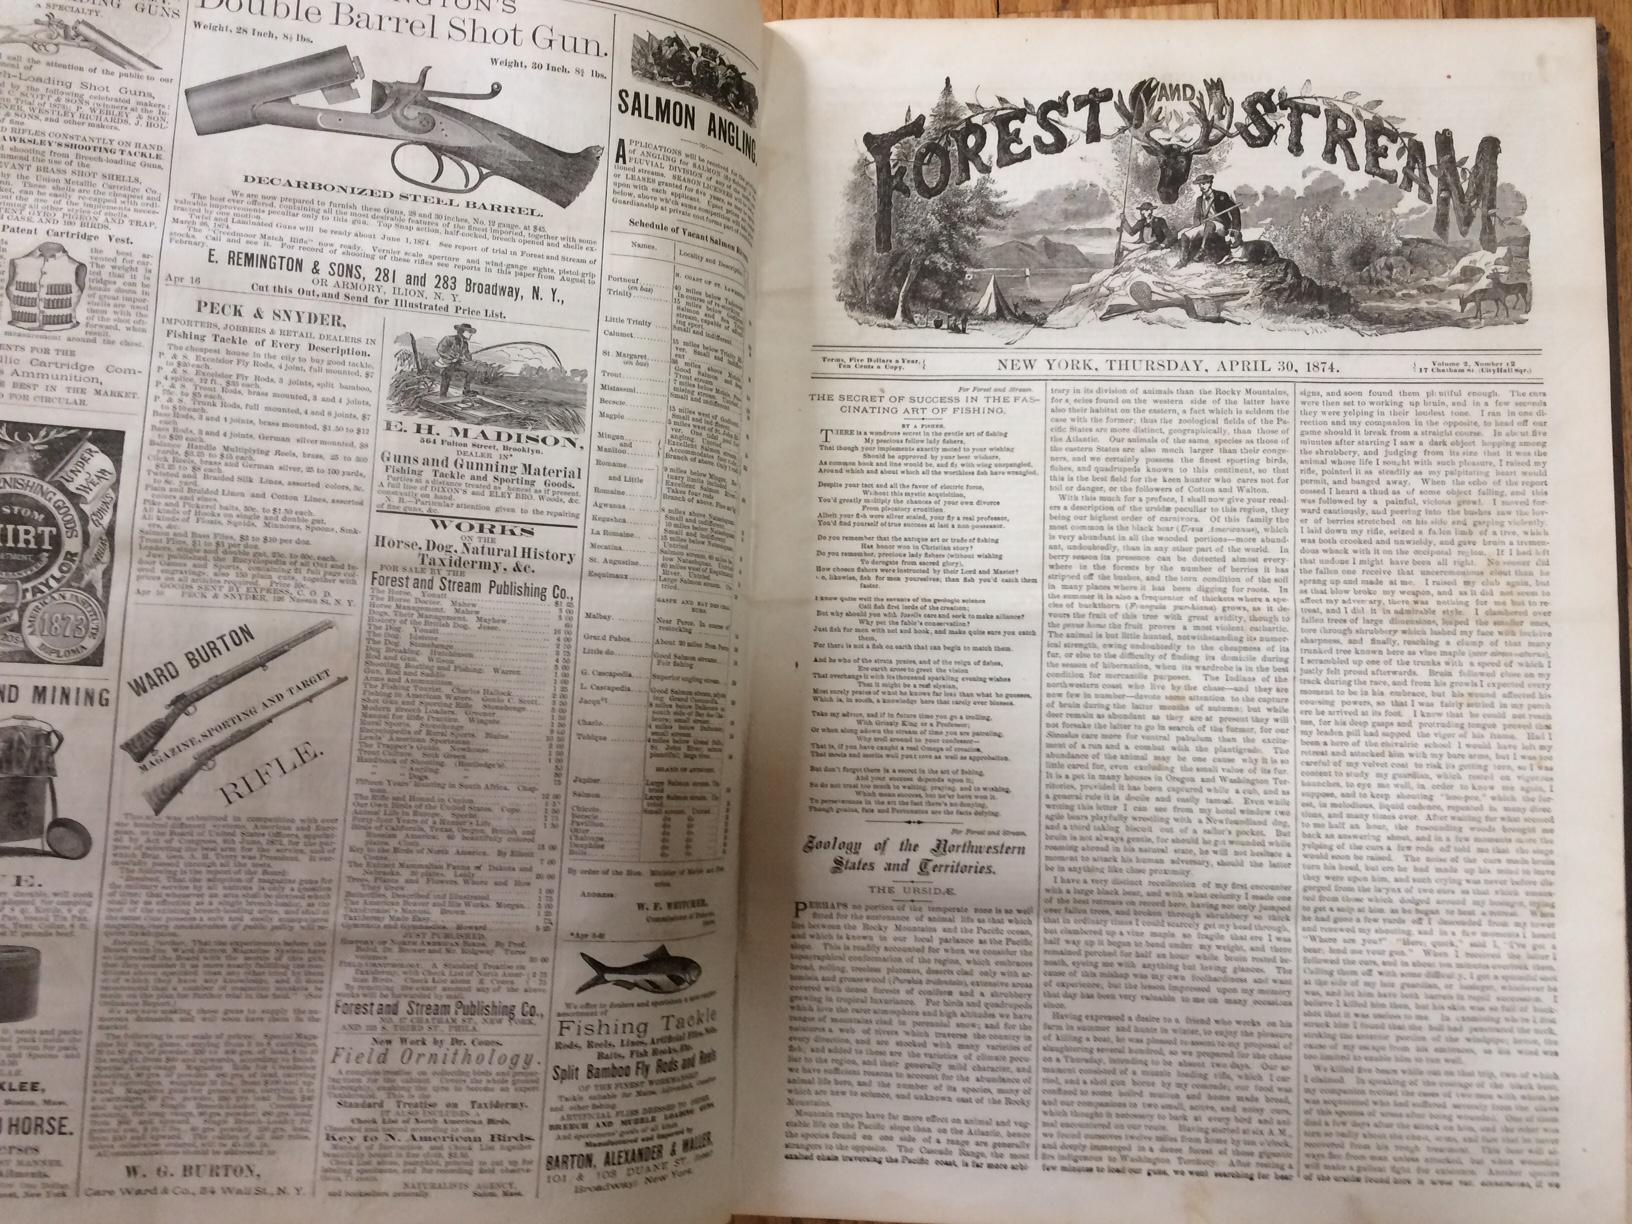 FOREST AND STREAM (Magazine). Bound Volume II, Feb. 12, 1874-Aug. 6, 1874. Hardcover